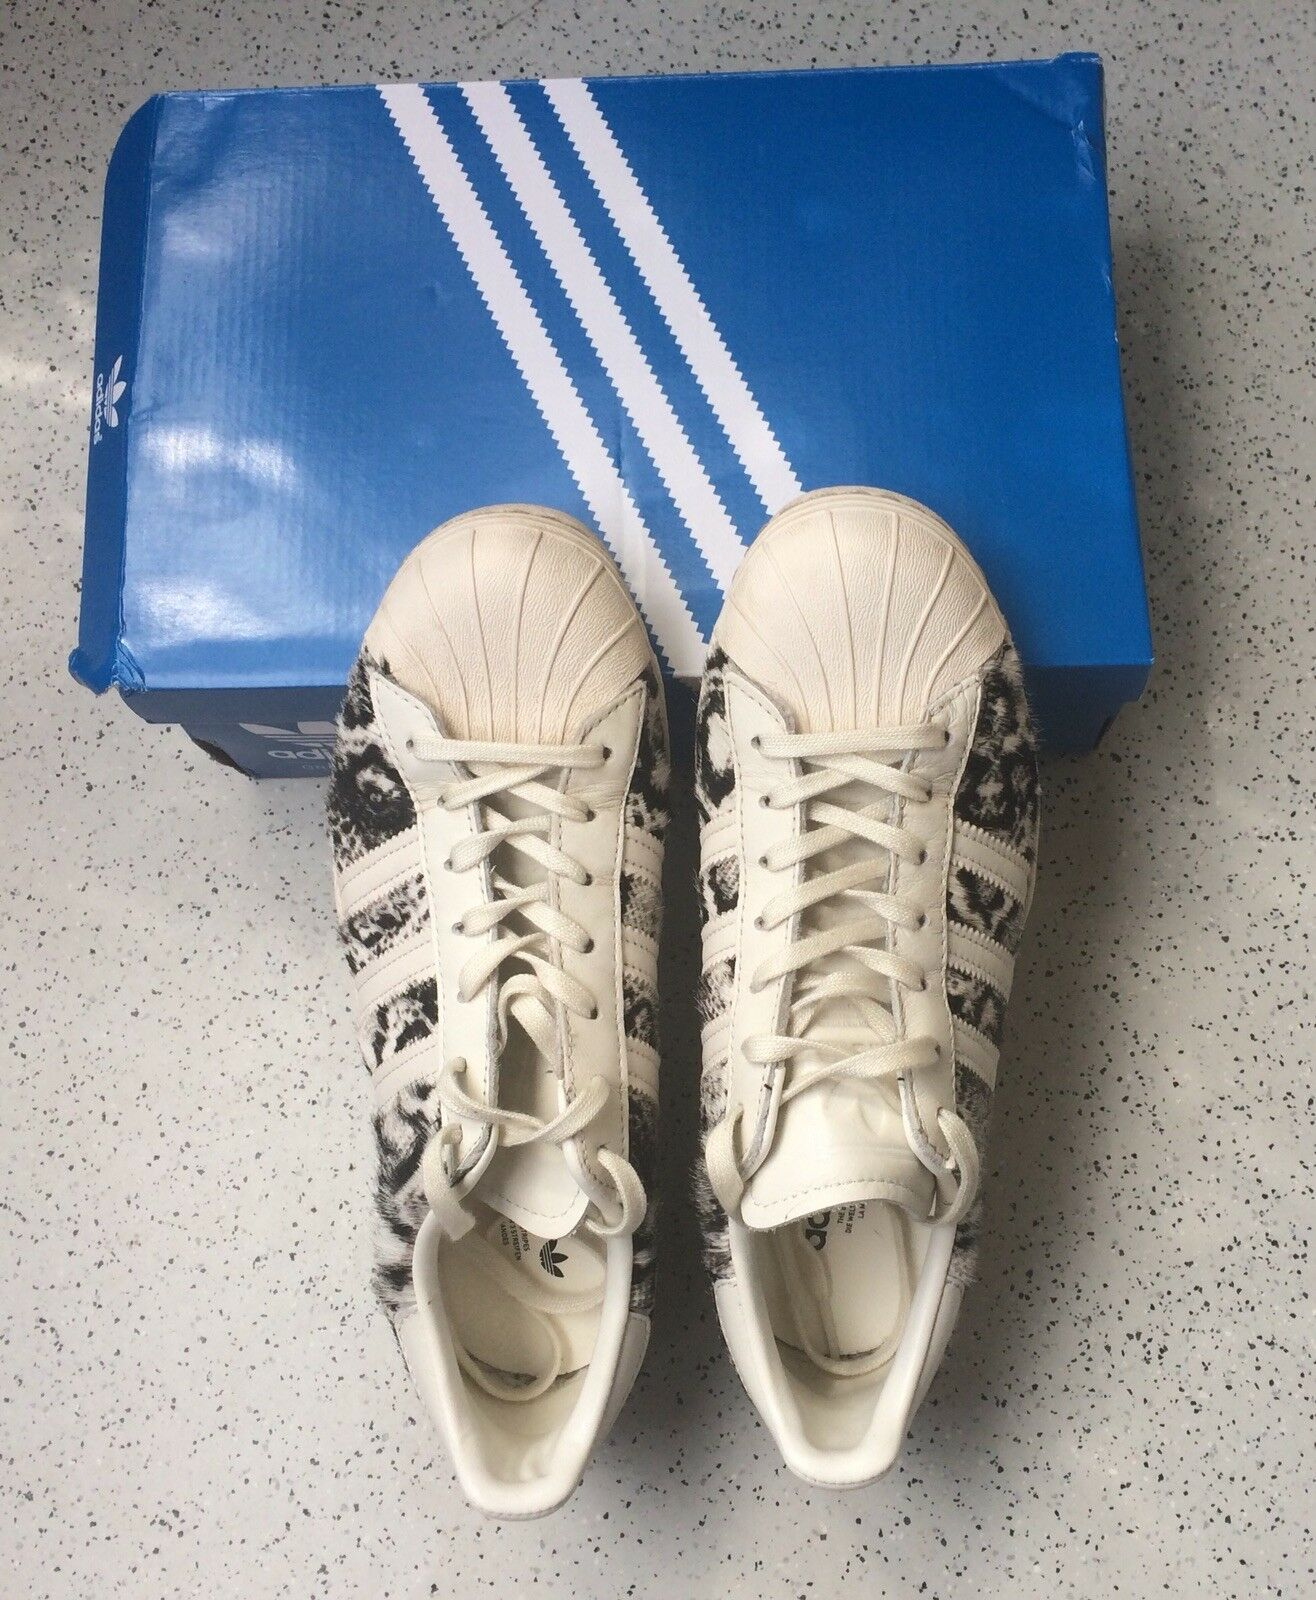 buy popular d0638 78606 32 Nike Vapor Untouchable 2 2 2 WD Football Cleats White Black 892680-100  ...